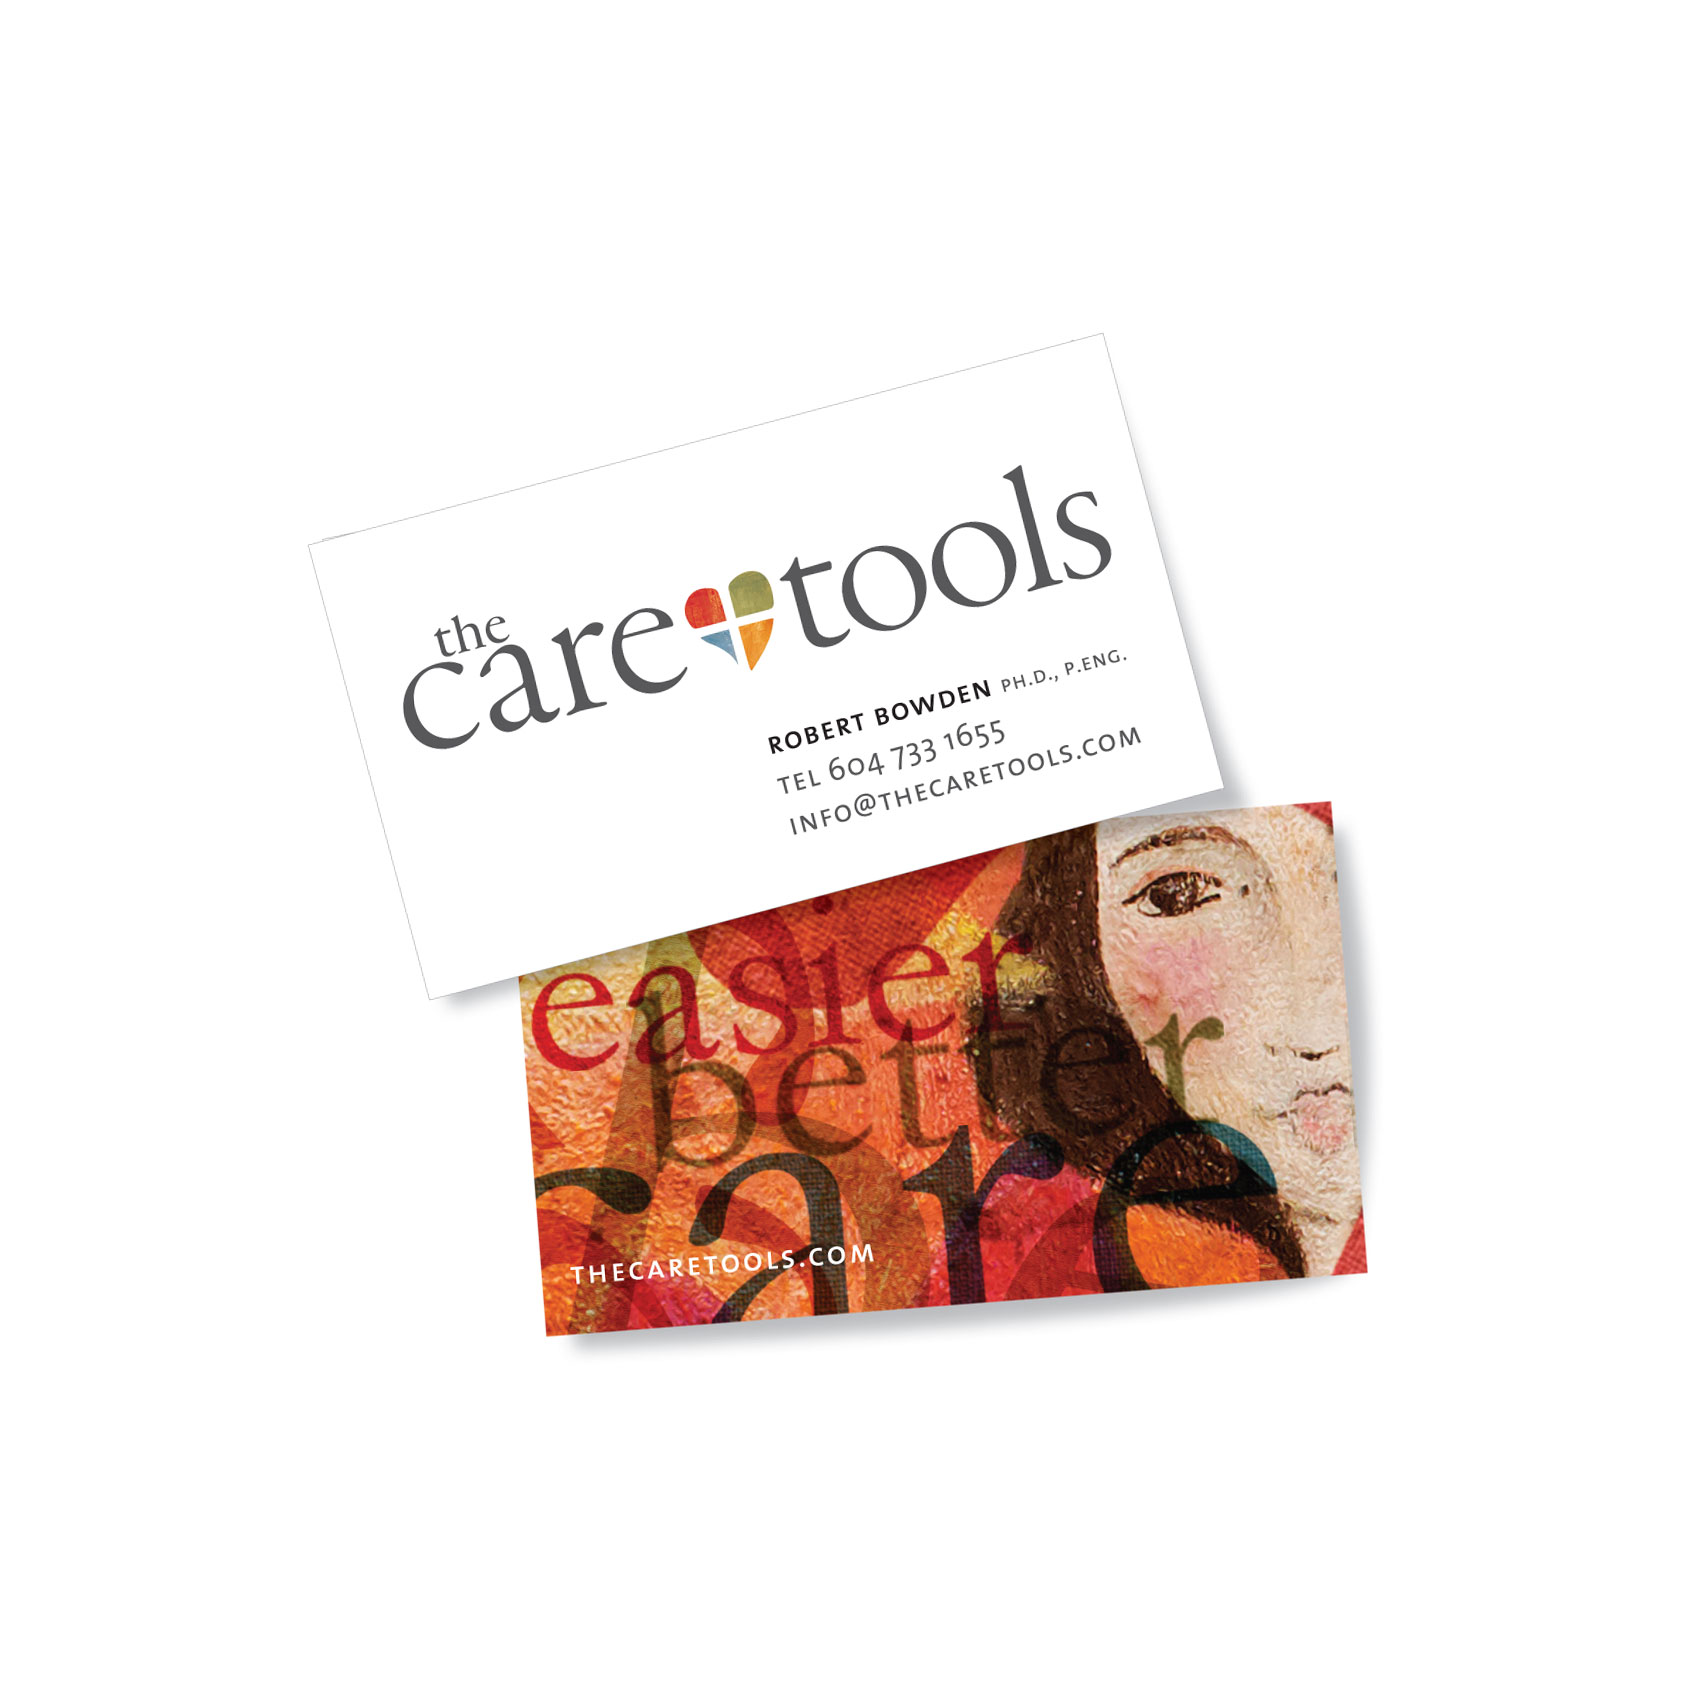 tct_cards.jpg